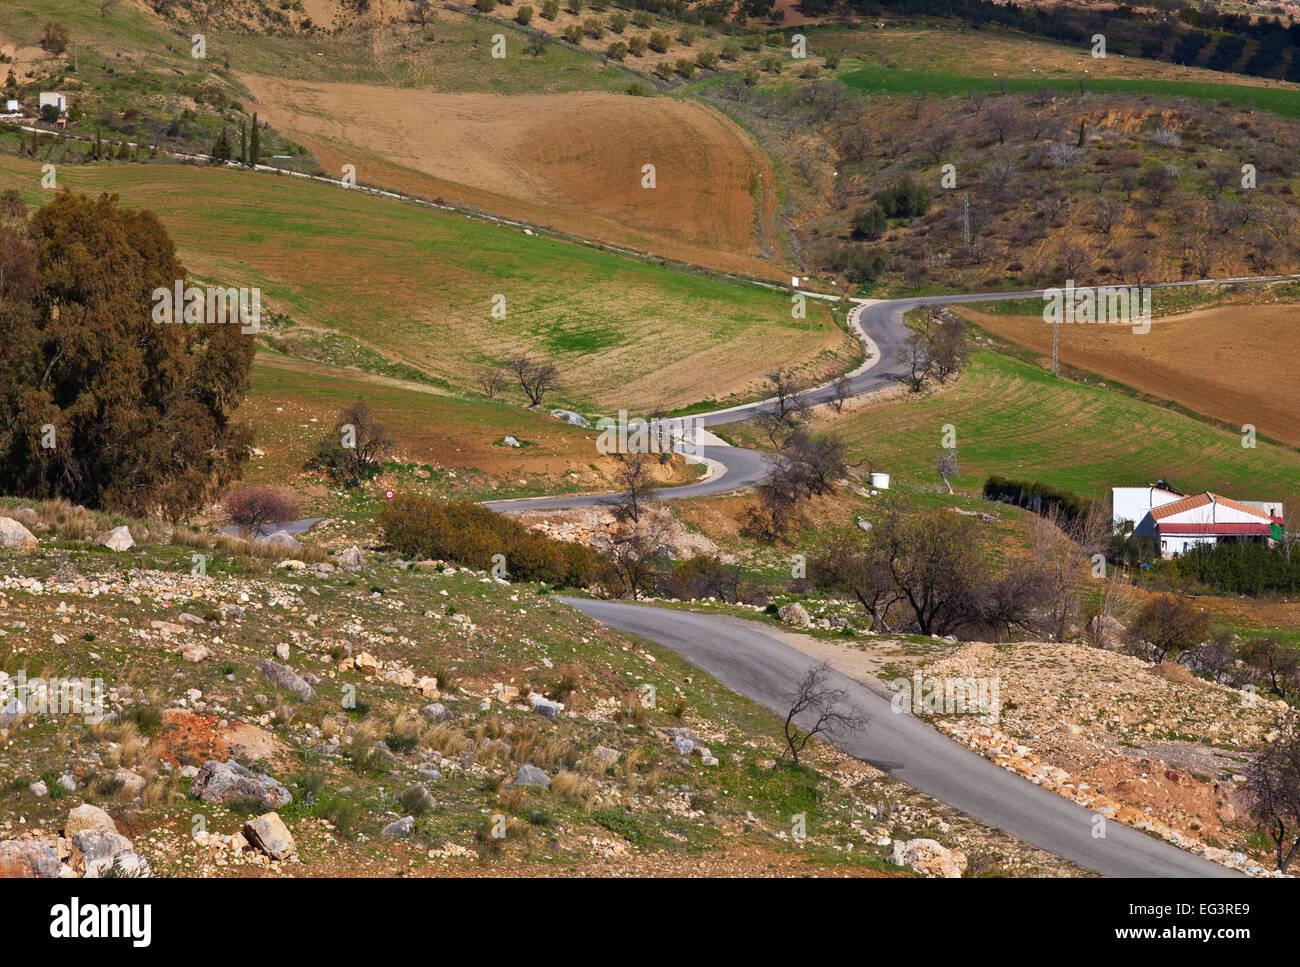 Road across farmland at the edge of El Torcal,  Antequera, Malaga Province,  Andalucia, Spain - Stock Image